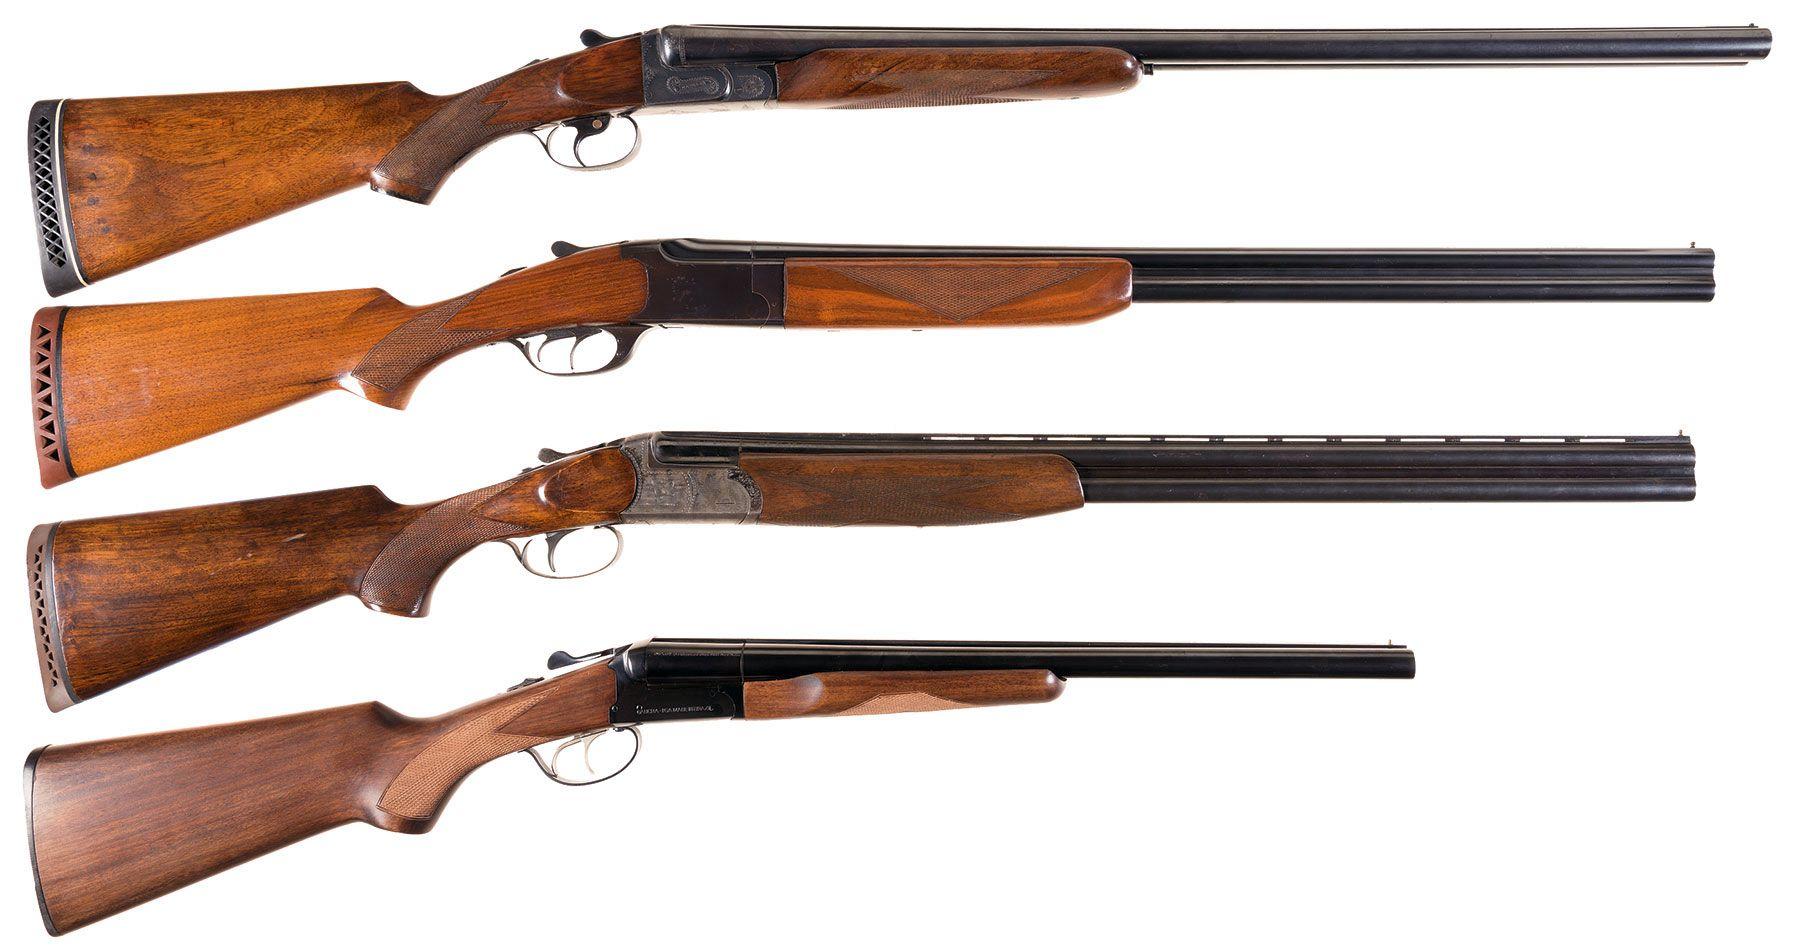 Four Shotguns -A) Factory Engraved AYA Matador Double Barrel Sho